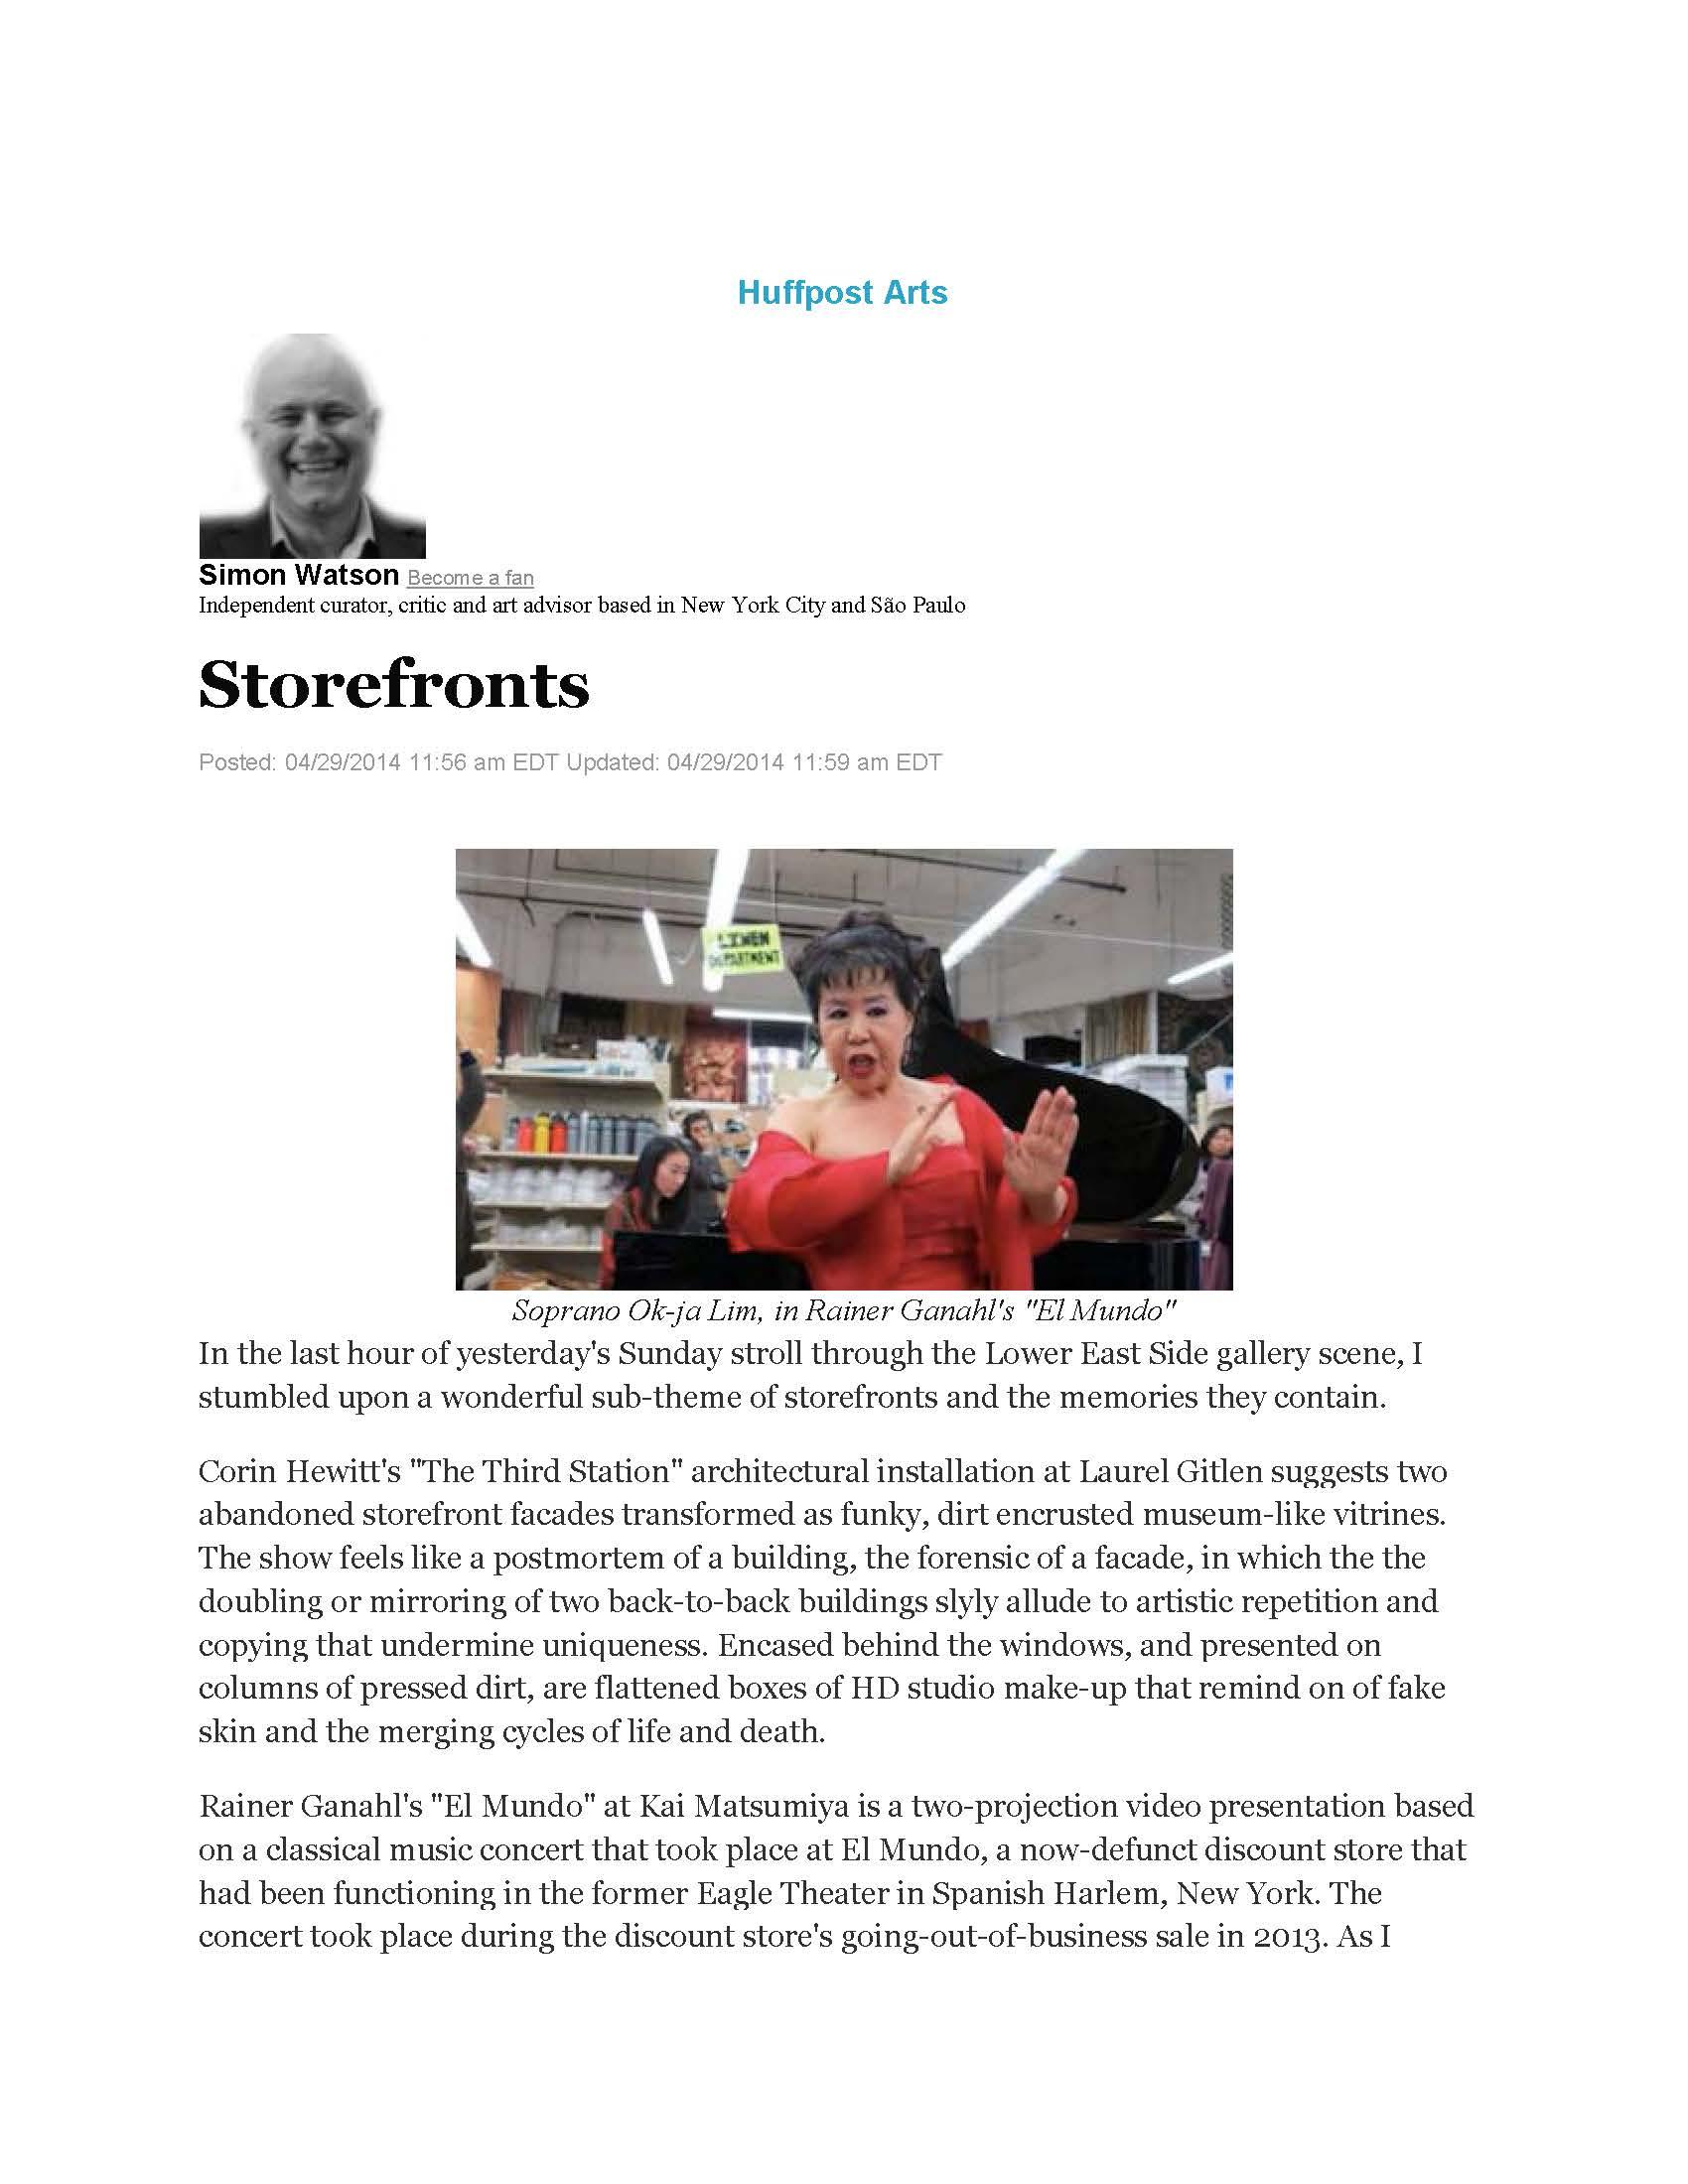 Simon Watson, Storefronts_Page_1.jpg